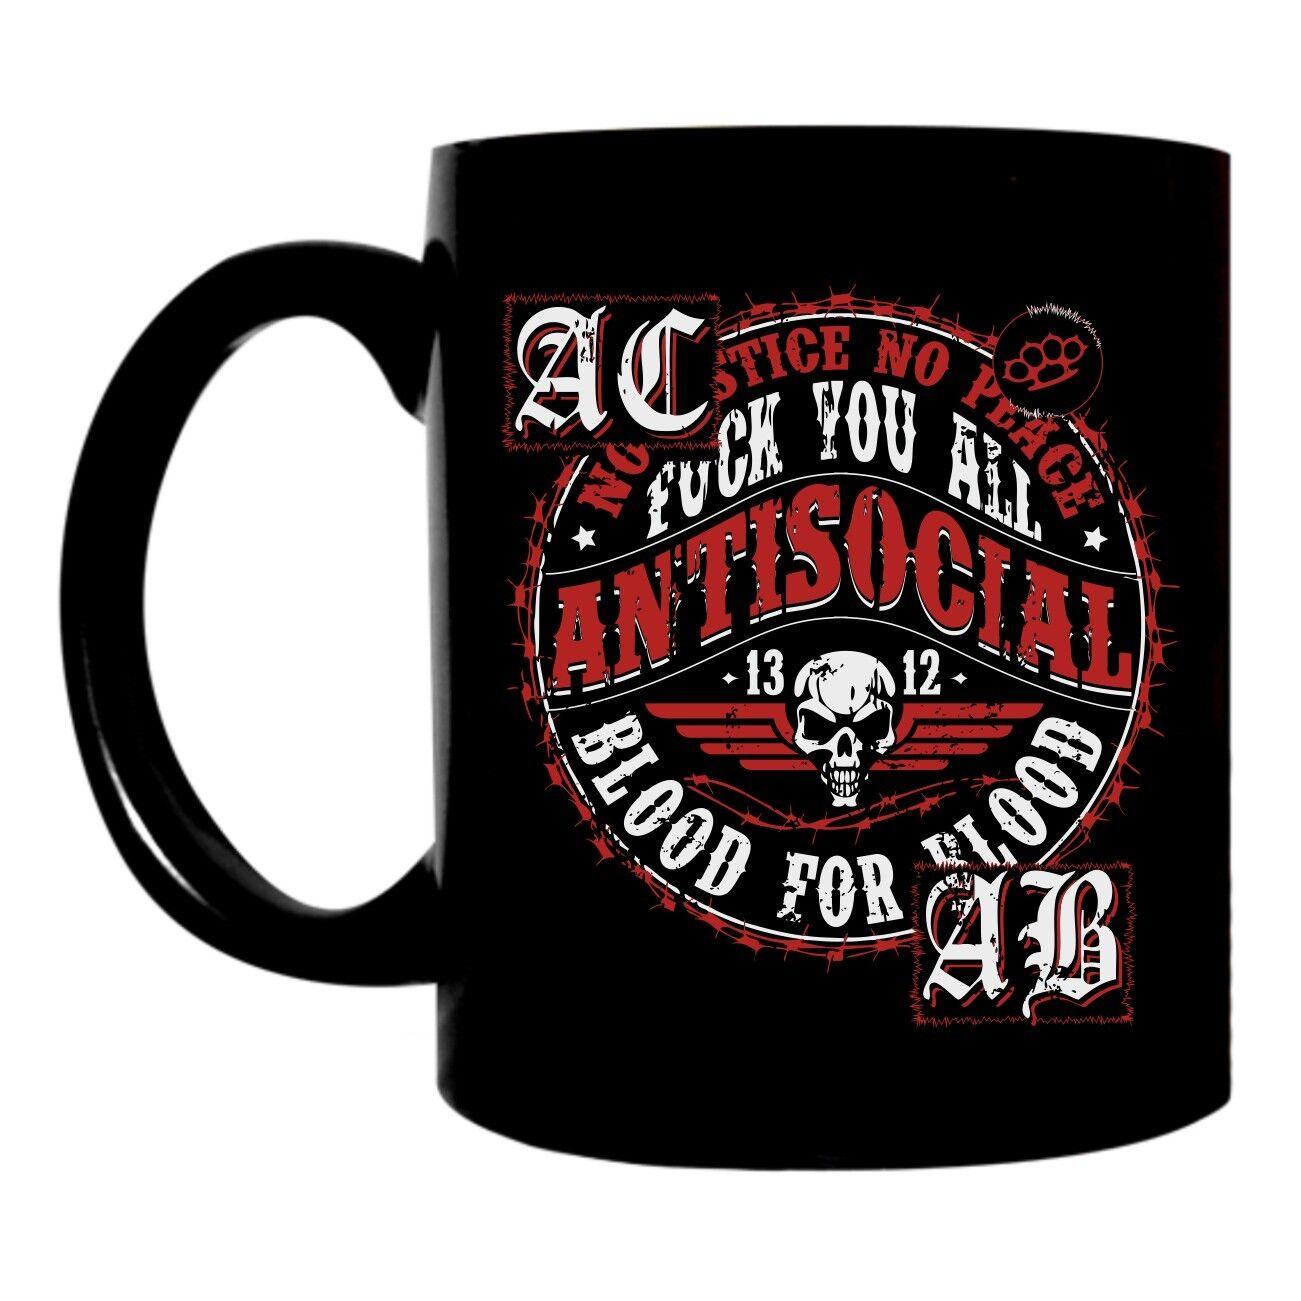 Tasse de café Gobelet Gobelet Gobelet Antisocial ultras skinhead KC asociale catégorie A.C. A.B. FTW 8ee9b8